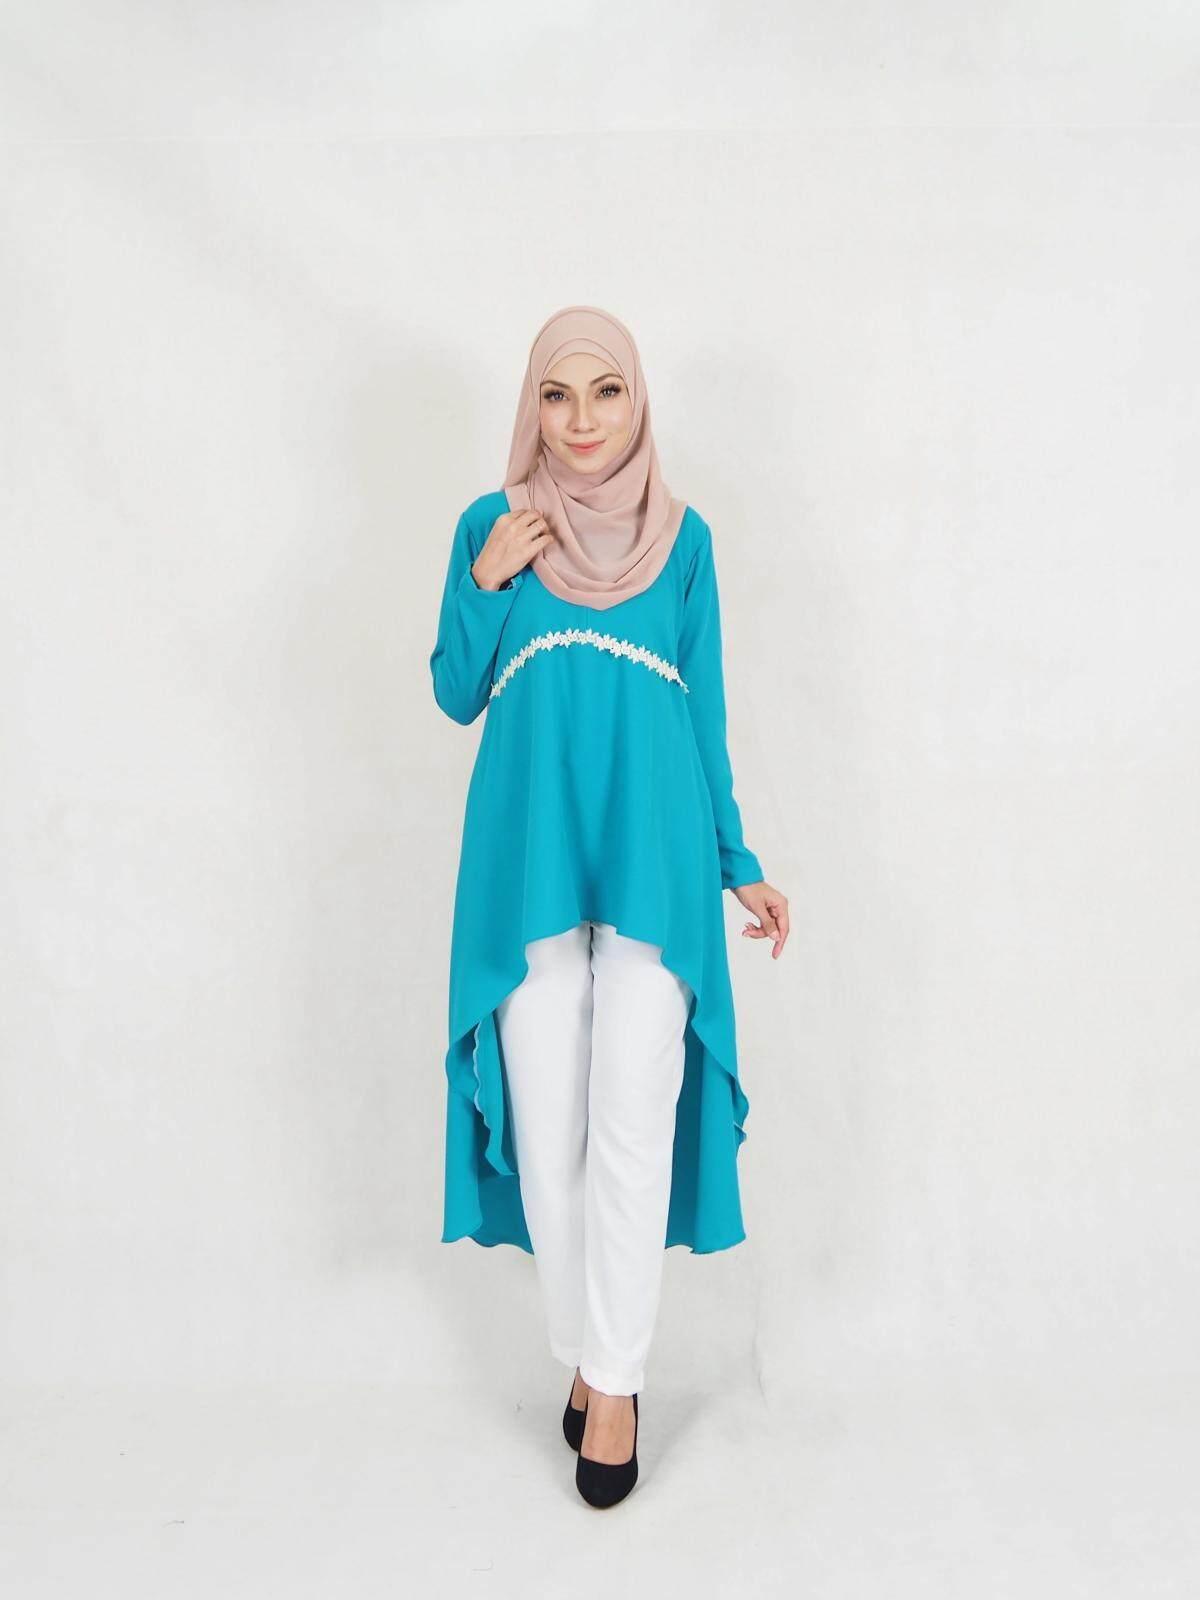 Muslimah Women Fashion Flowe Fishtail Blouse and Pant Set Plus Size / Kylie Flower Fishtail Set Blouse + Palazzo Pant (XXL-5XL) / Fishtail Blouse n Pant Set Moden Baju Raya 2019